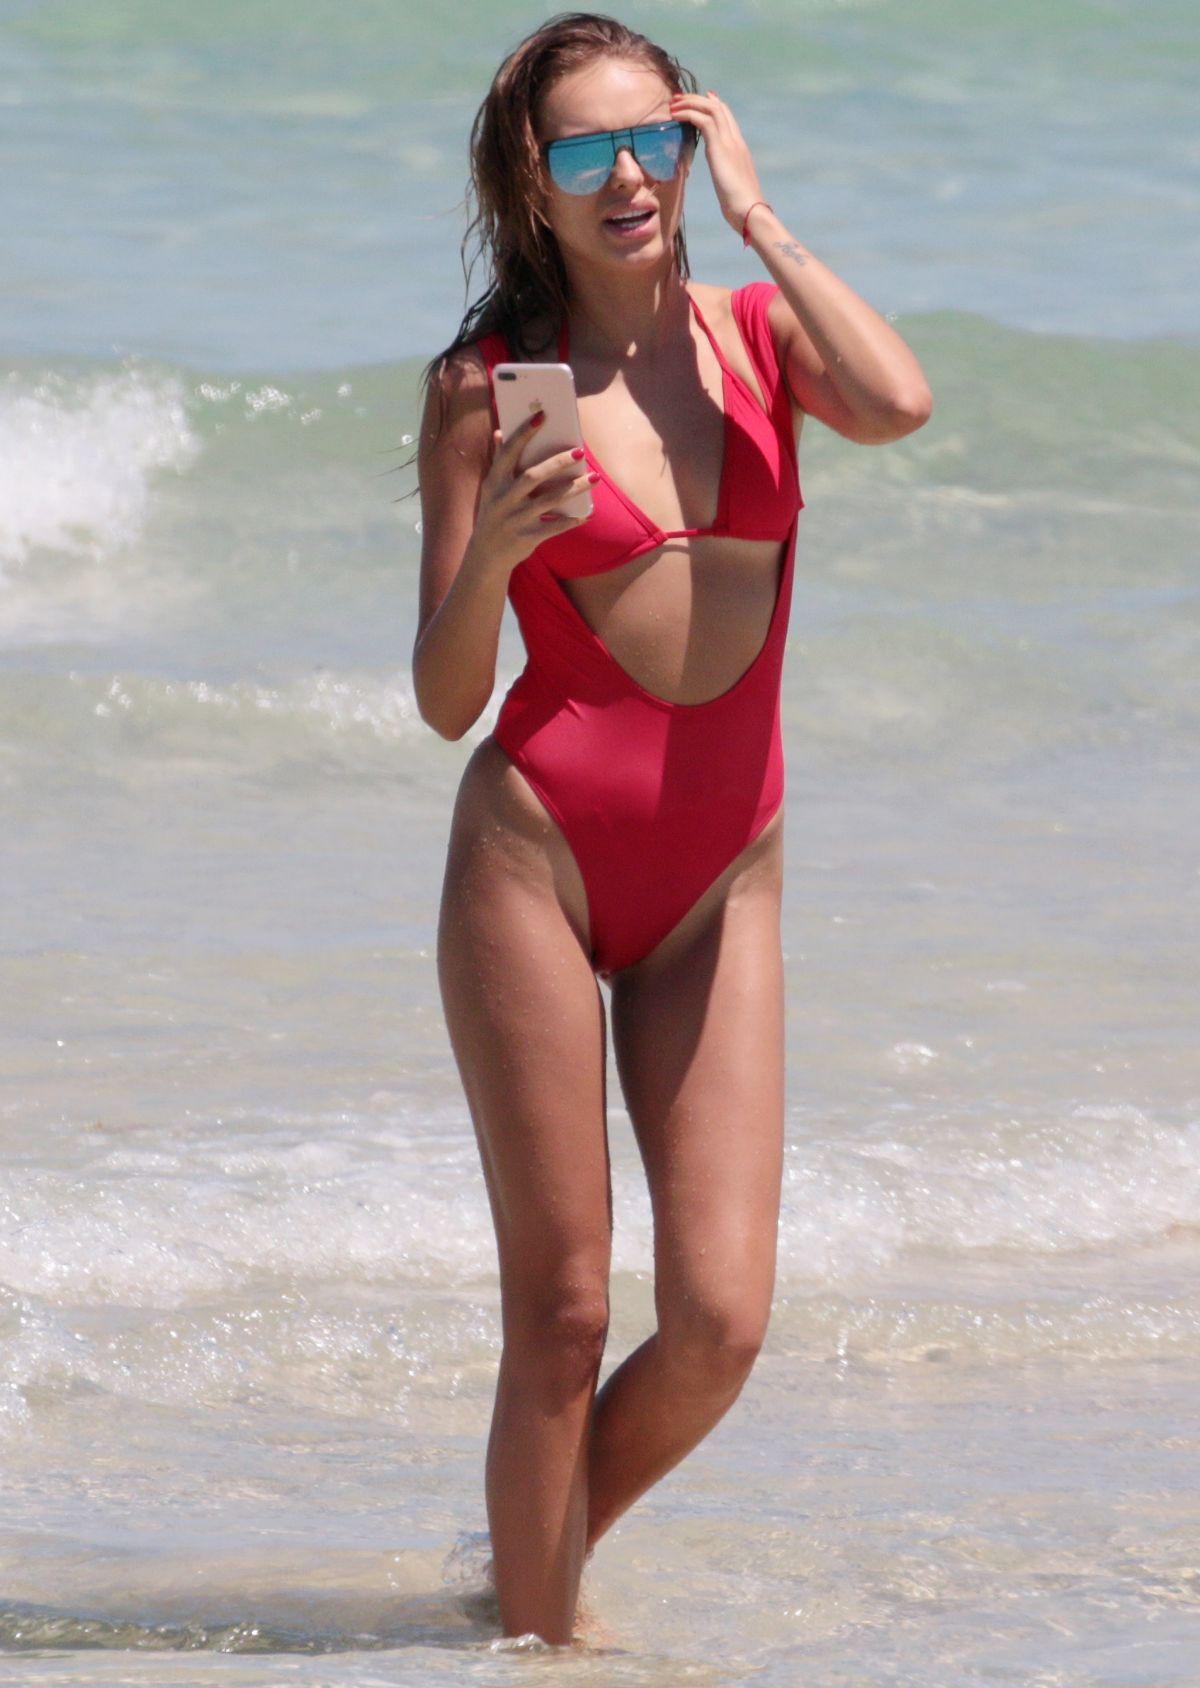 Fotos Hanna Ivanova nudes (75 foto and video), Sexy, Sideboobs, Boobs, braless 2015